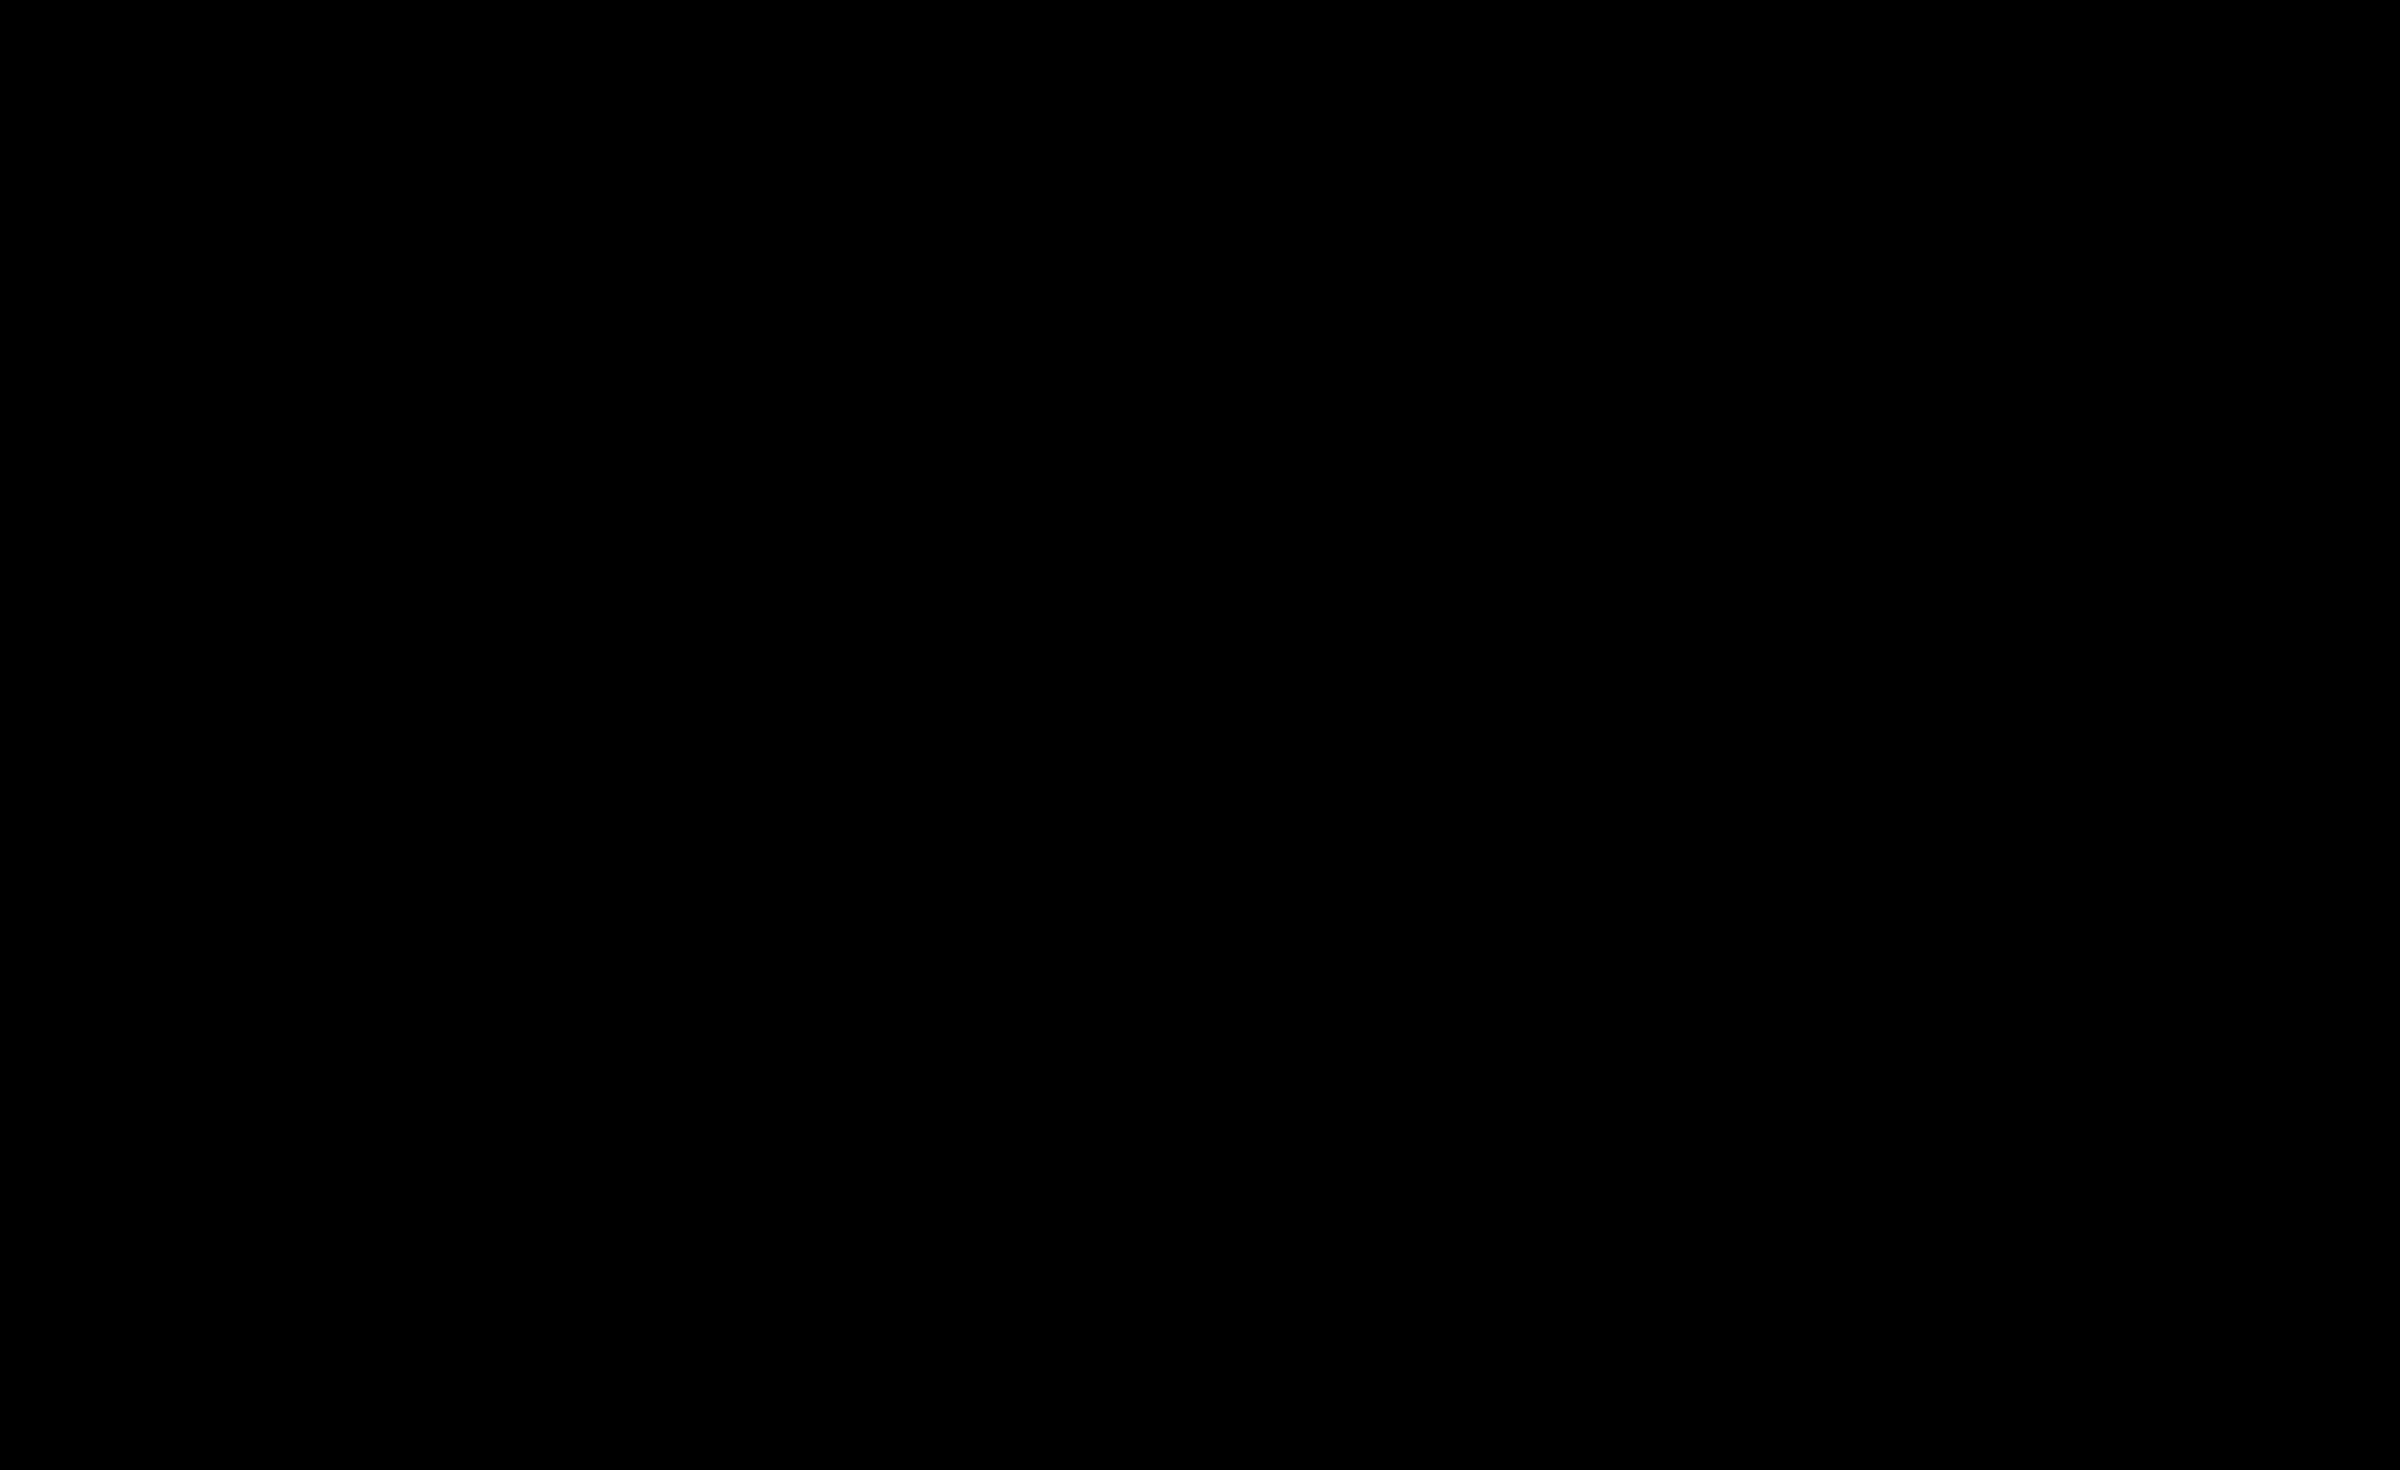 Stegosaurus skeleton Icons PNG